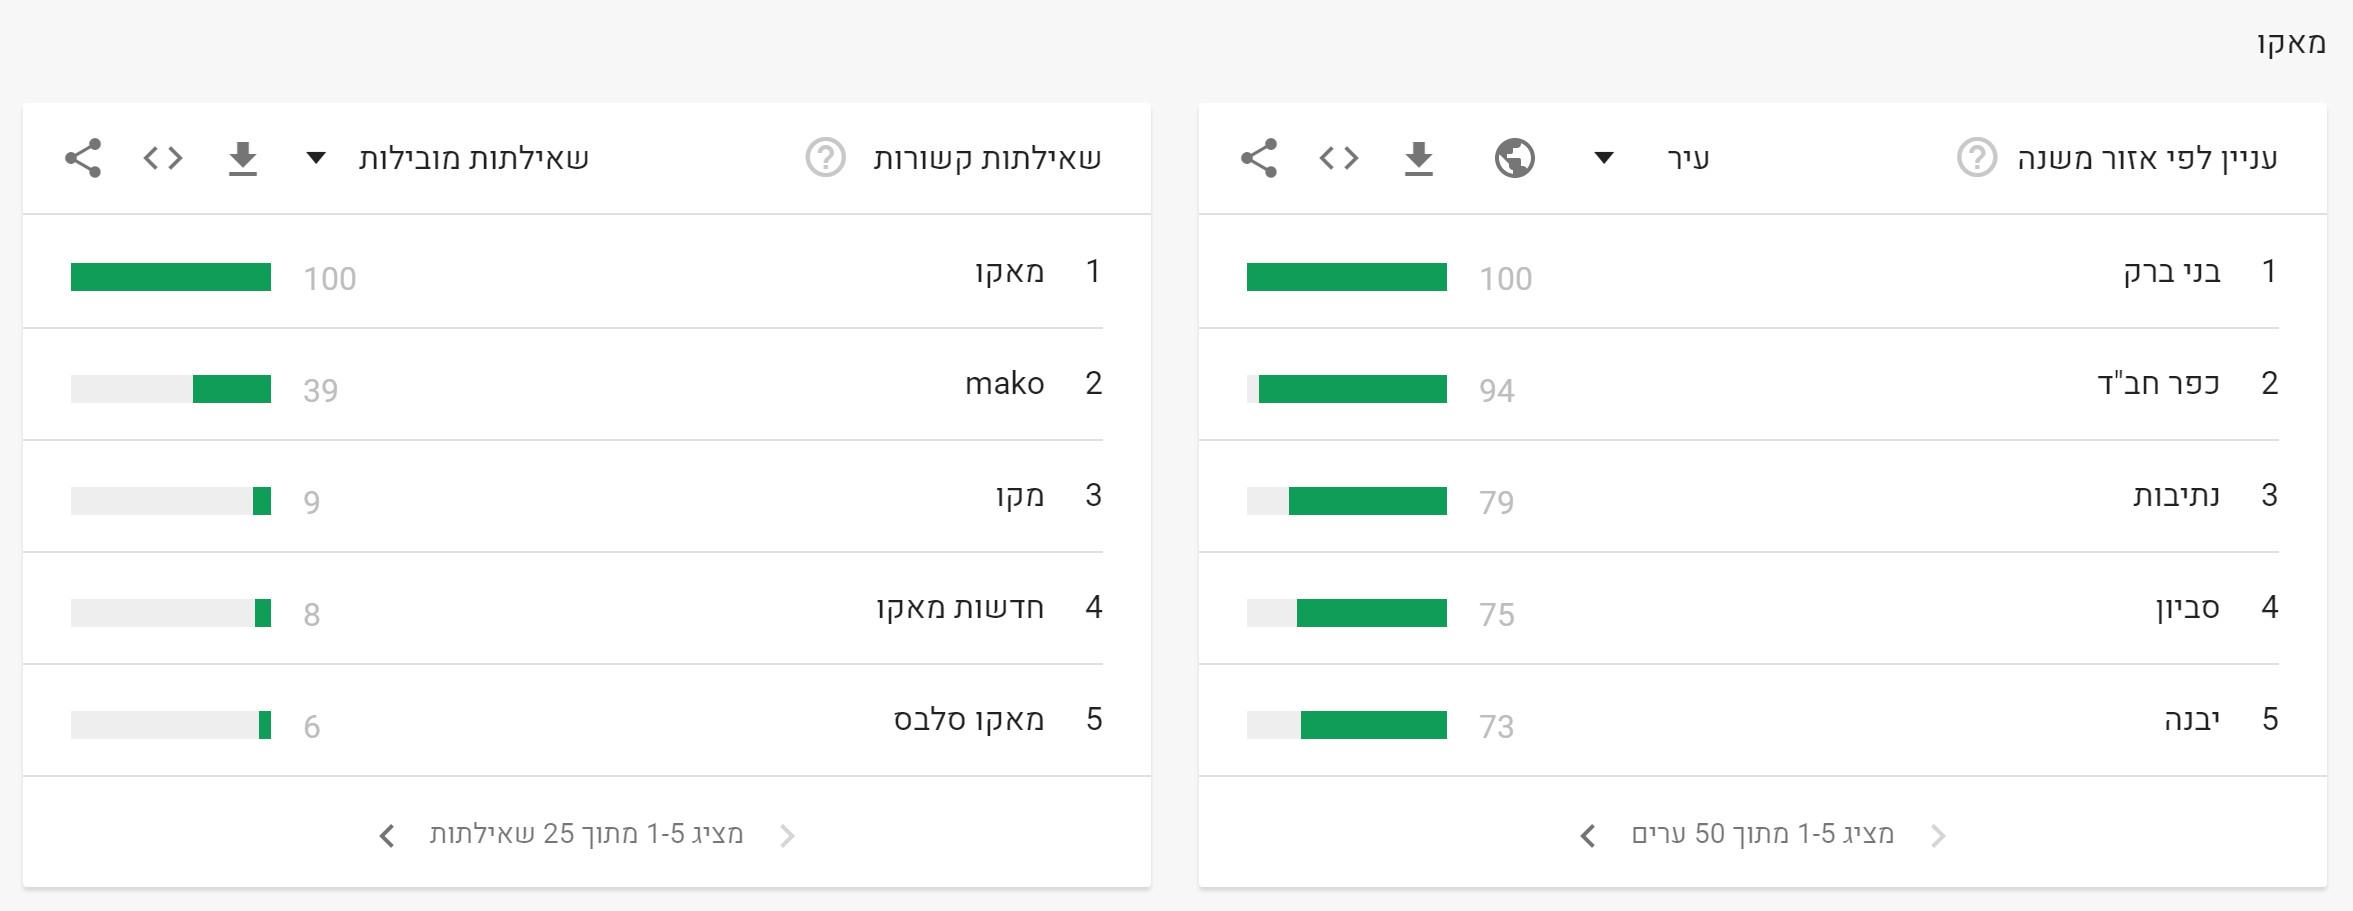 News 2019 in Google (10)